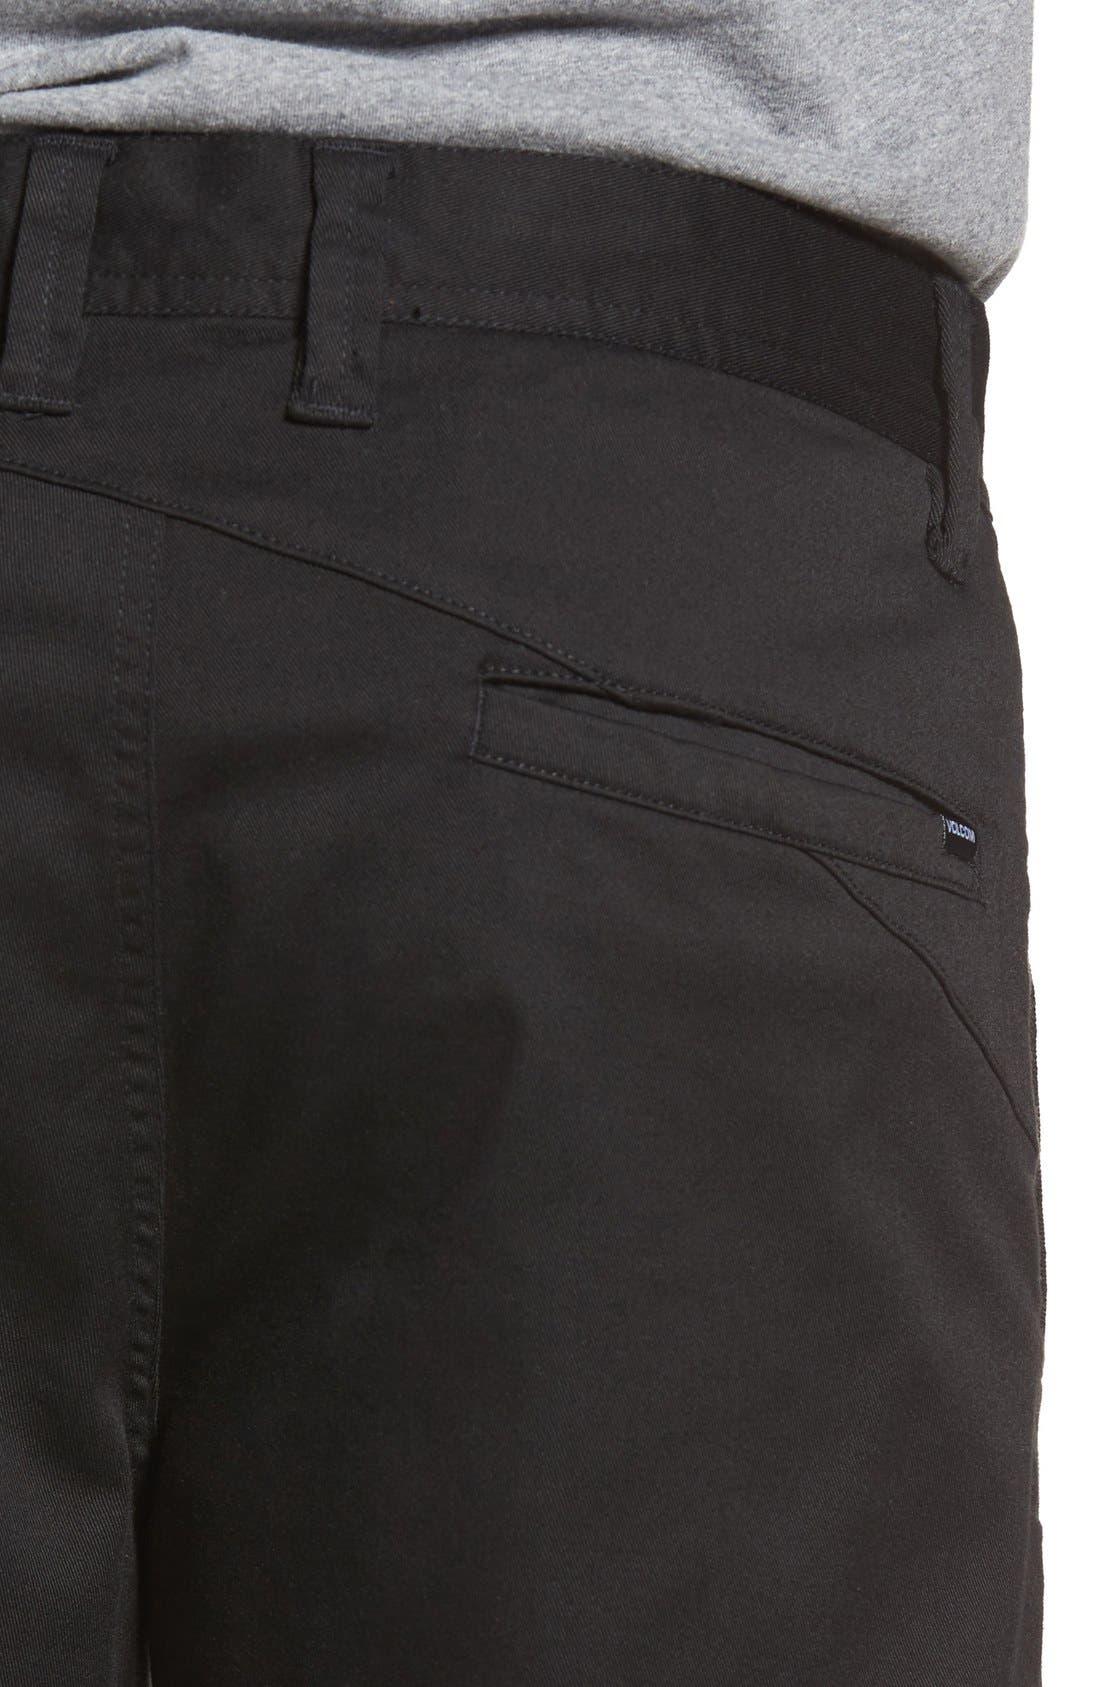 'Modern' Stretch Chino Shorts,                             Alternate thumbnail 15, color,